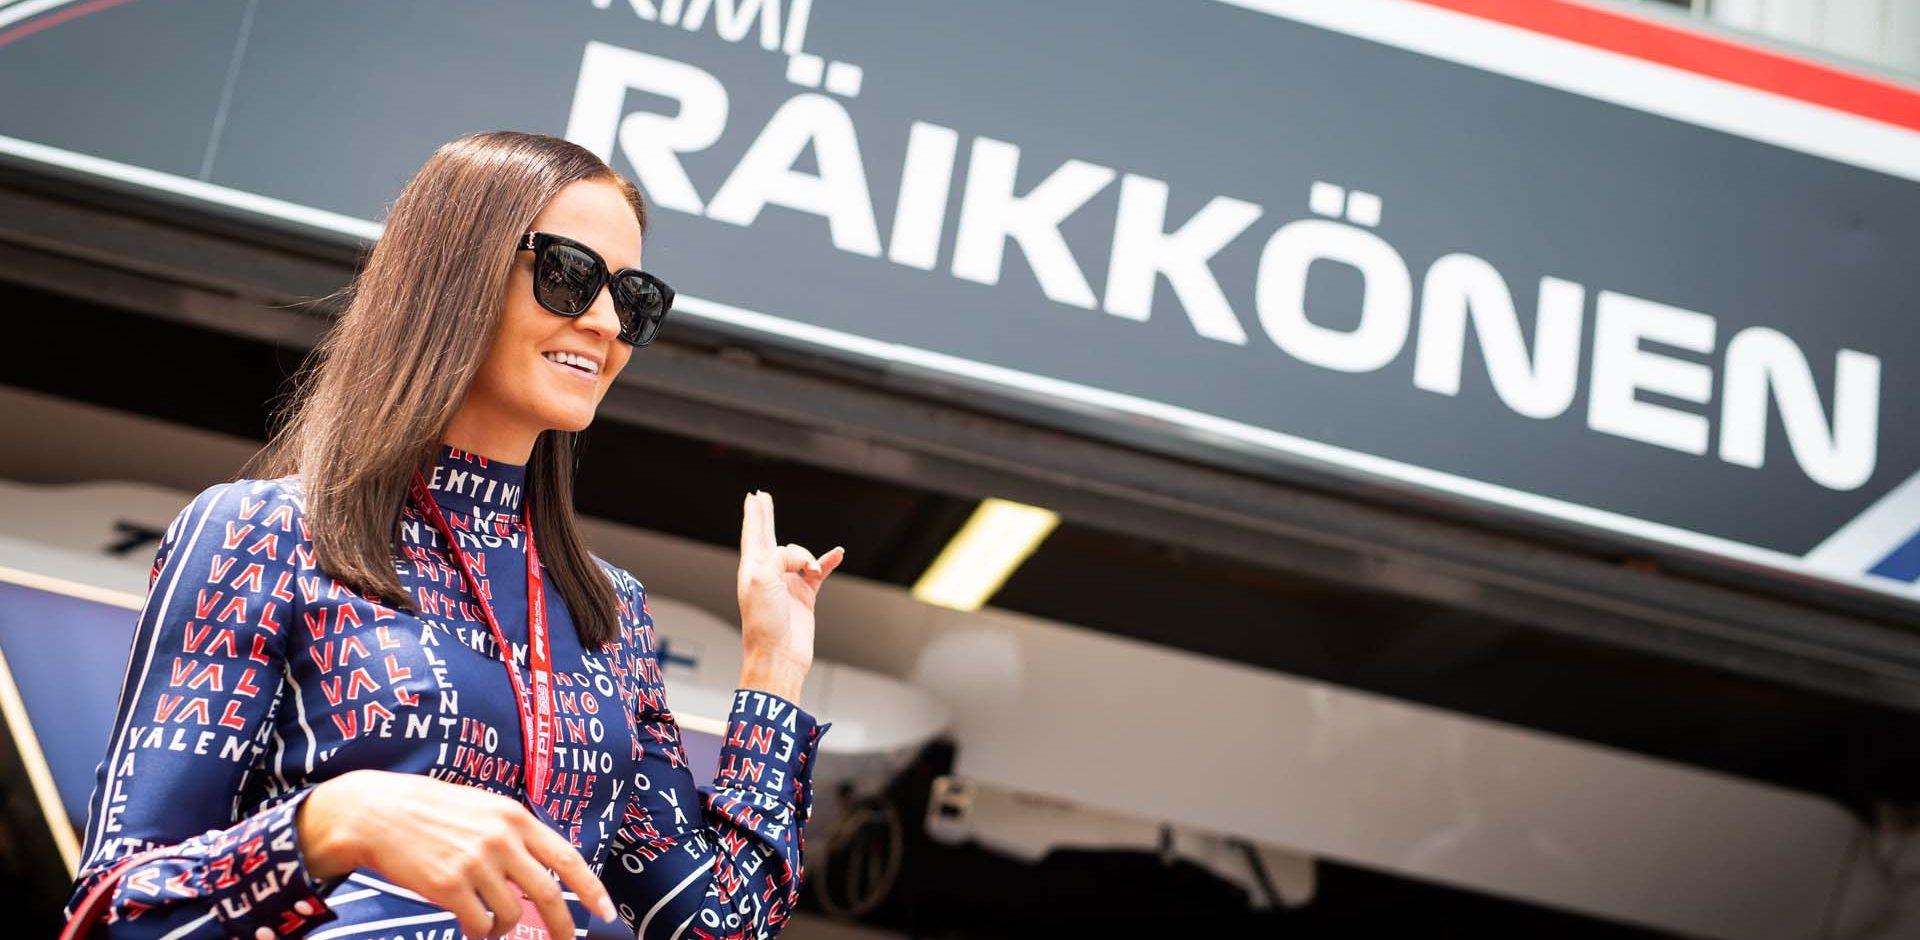 RAIKKONEN Minttu, wife of Kimi, portrait during the 2019 Formula One World Championship, Grand Prix of Monaco from on May 23 to 26 in Monaco - Photo Antonin Vincent / DPPI Räikkönen